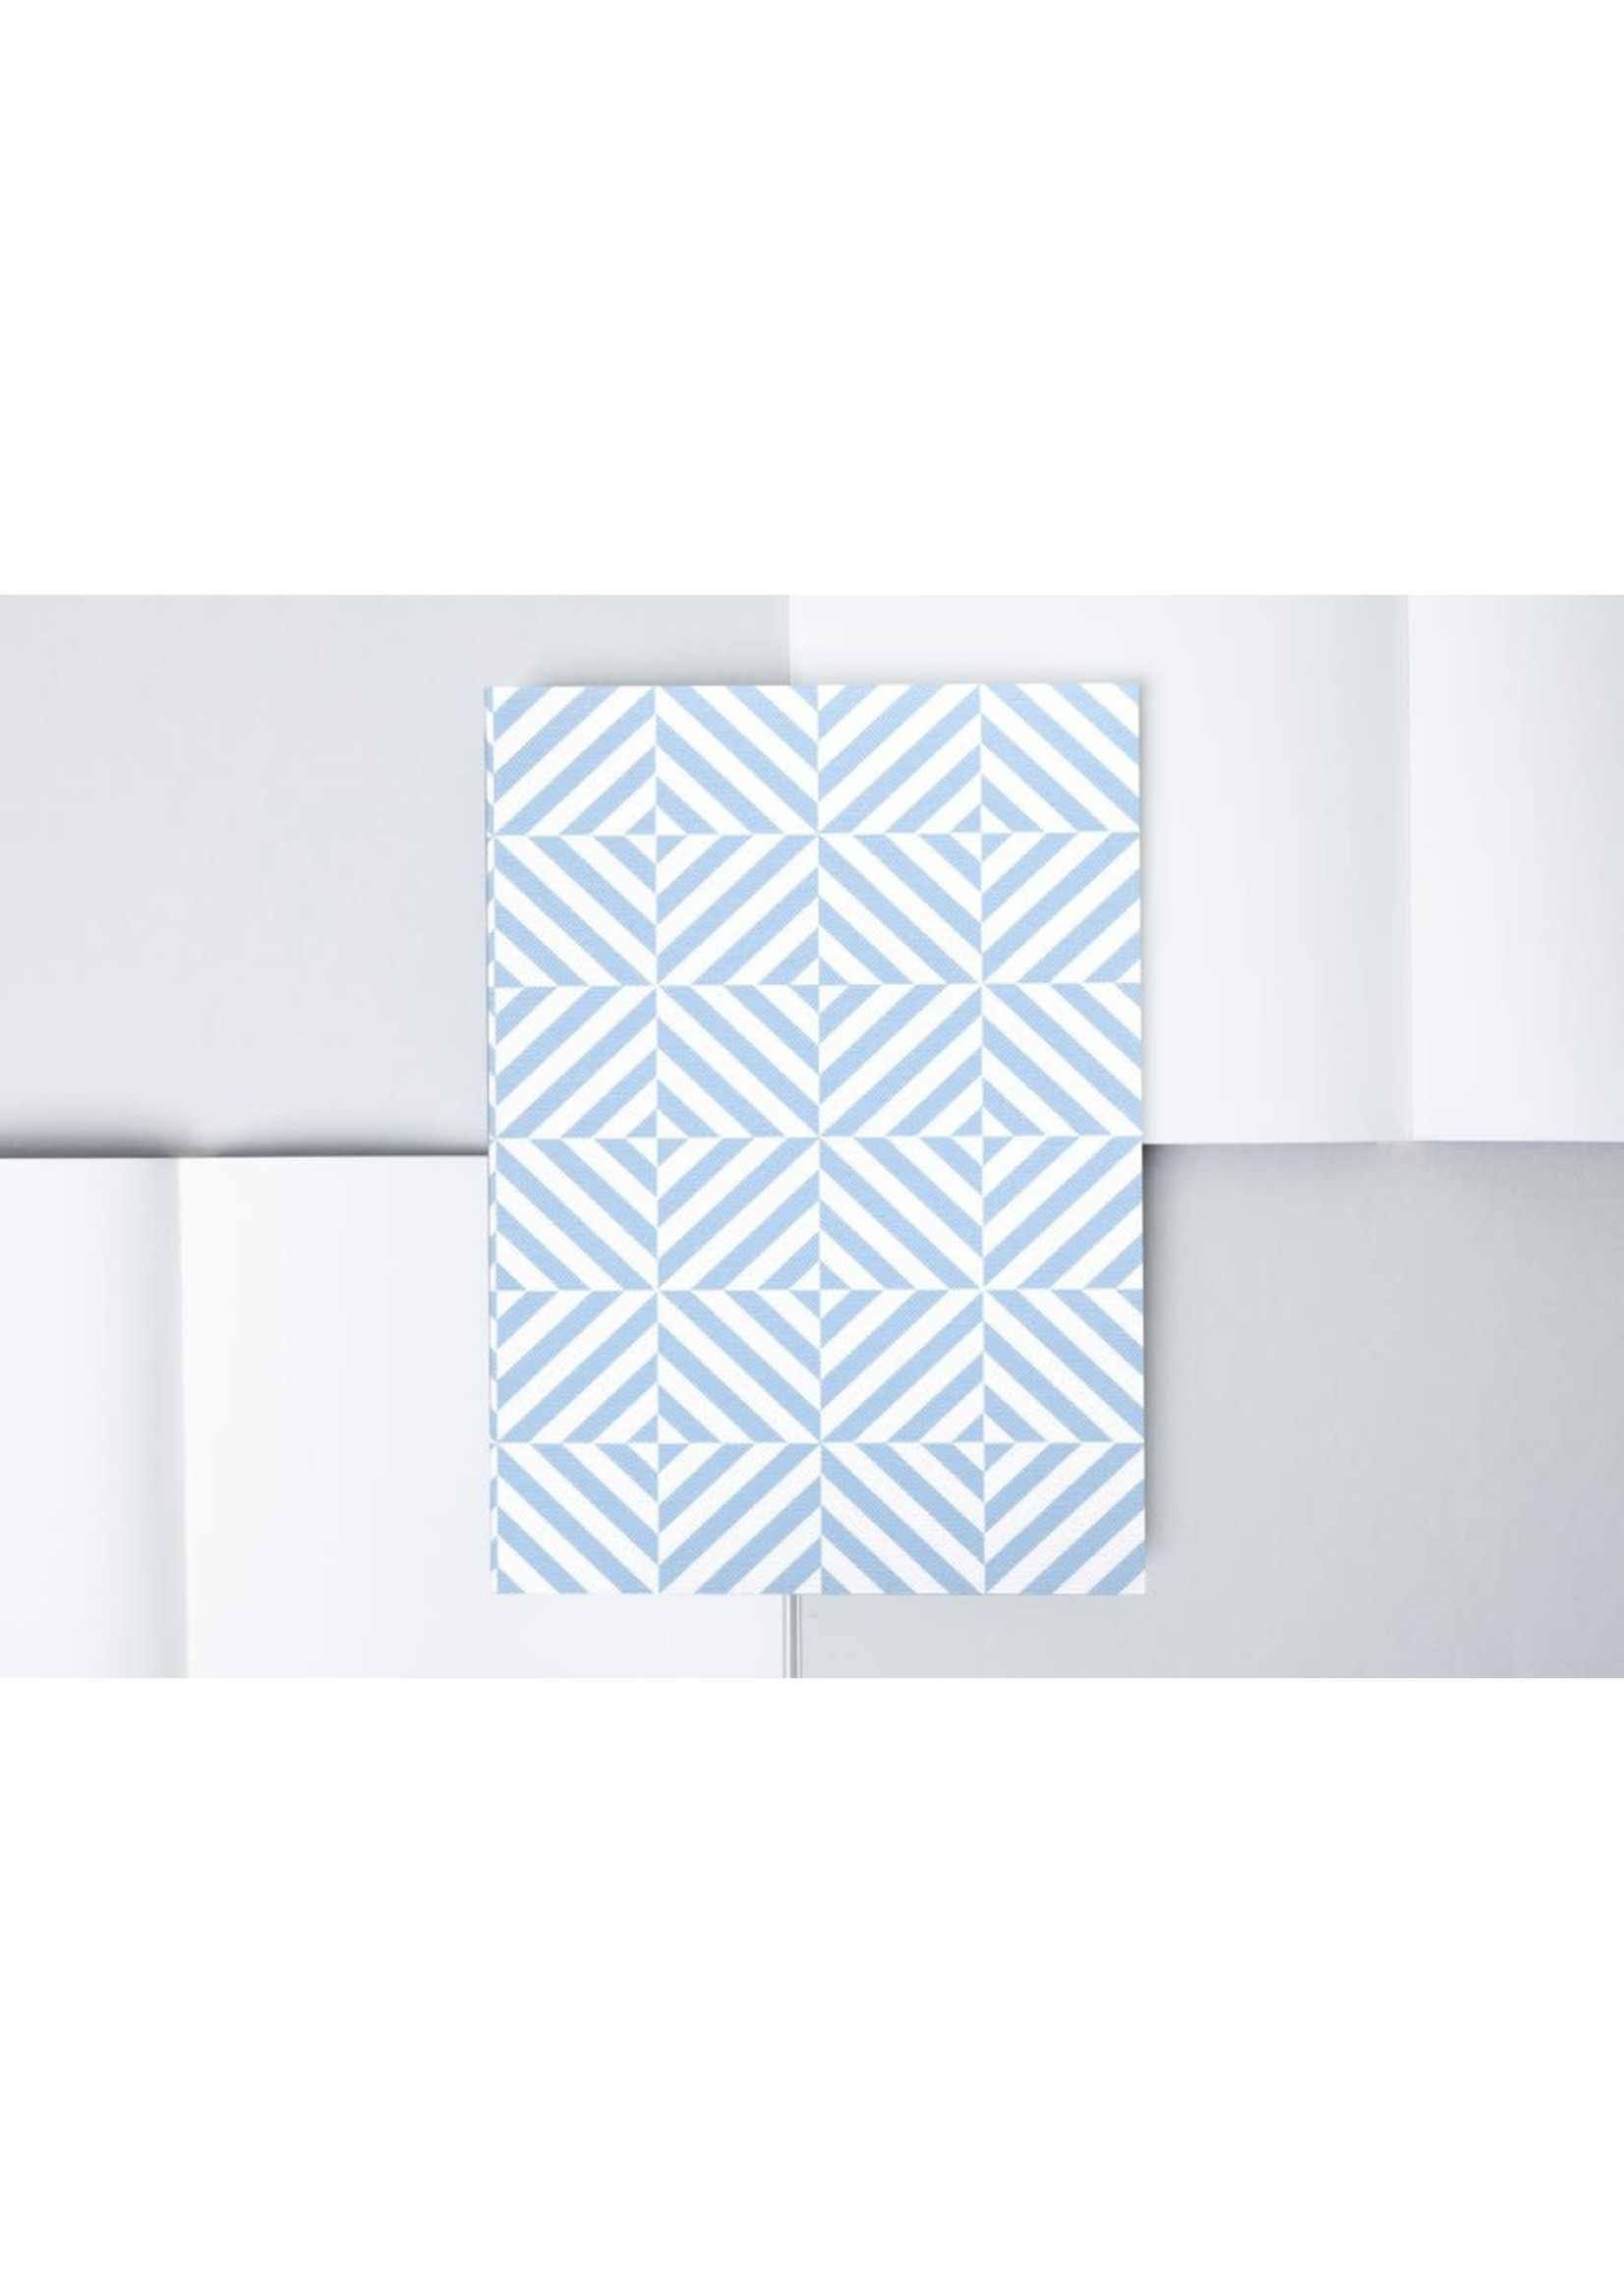 Ola Ola Medium Layflat Notebook - Alma Print in Salvia Blue/Plain Pages